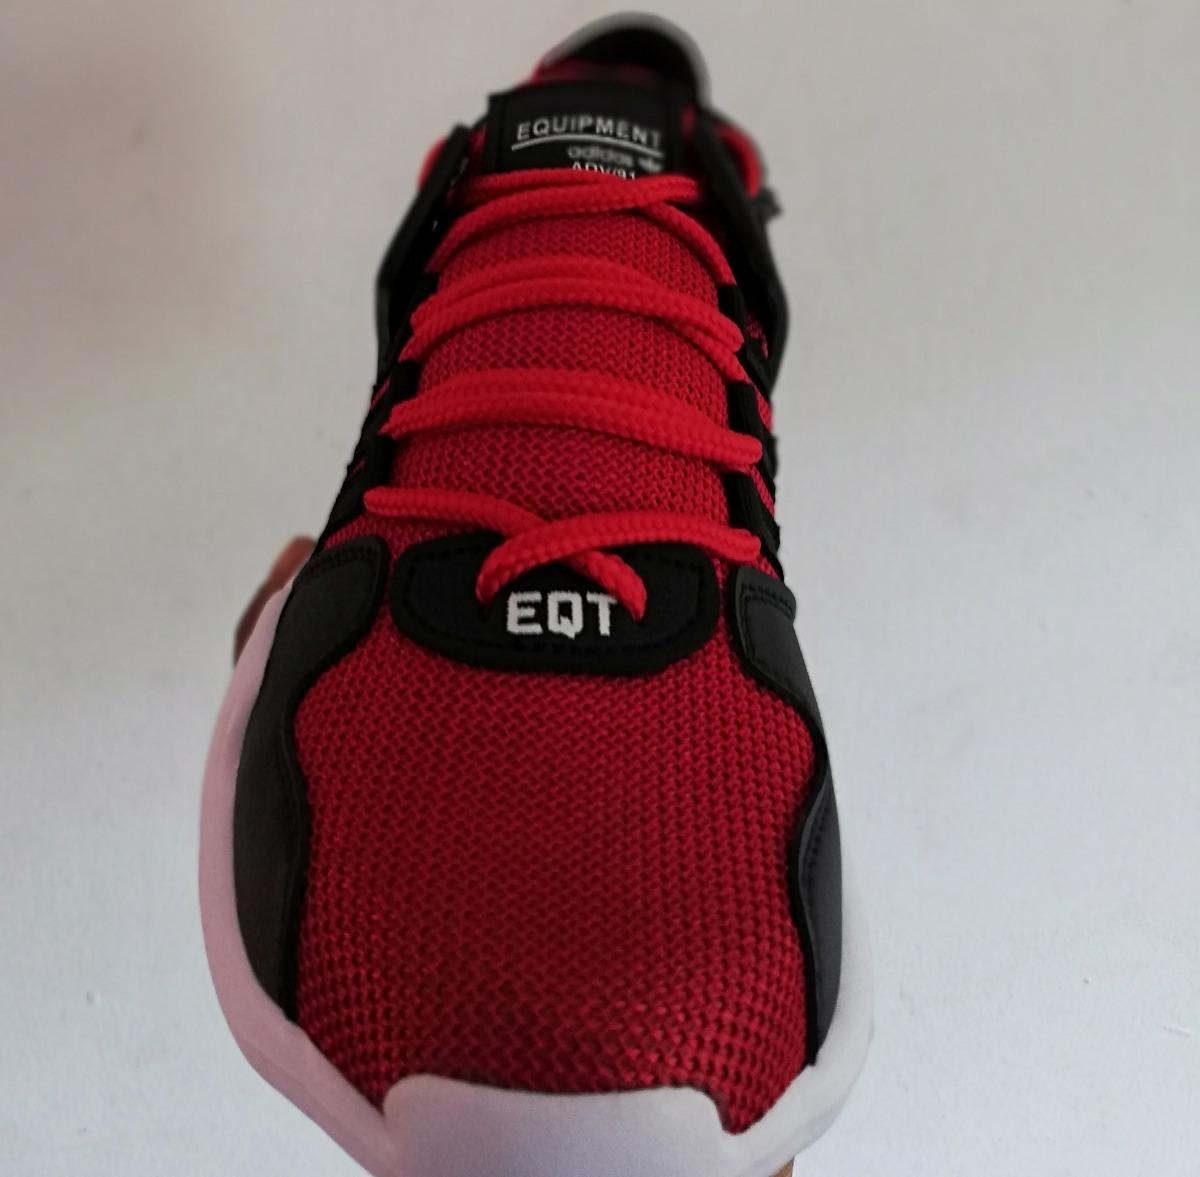 reputable site 7a412 f03df ... promo code for zapatos tenis adidas hombre mujer niño deportivo  calzado. cargando zoom. 38b97